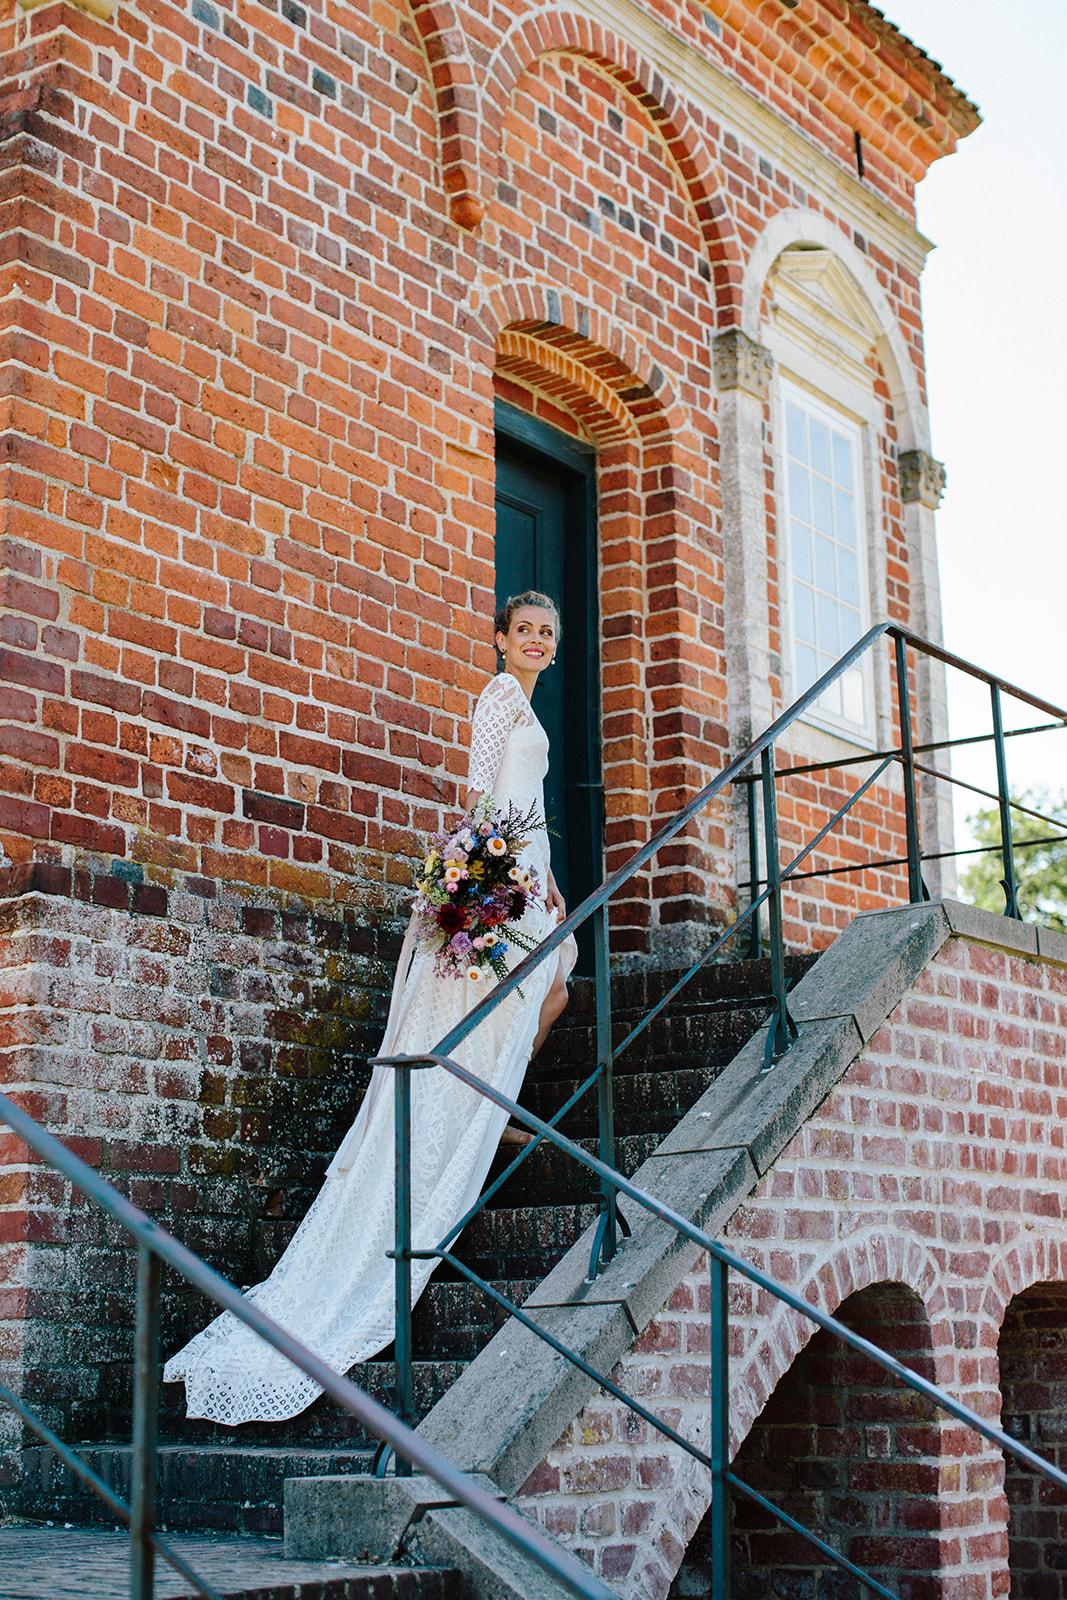 brudehår bytinajakobsen, rosenholm og Say oui brydekjoler og camilla-kirk-photography